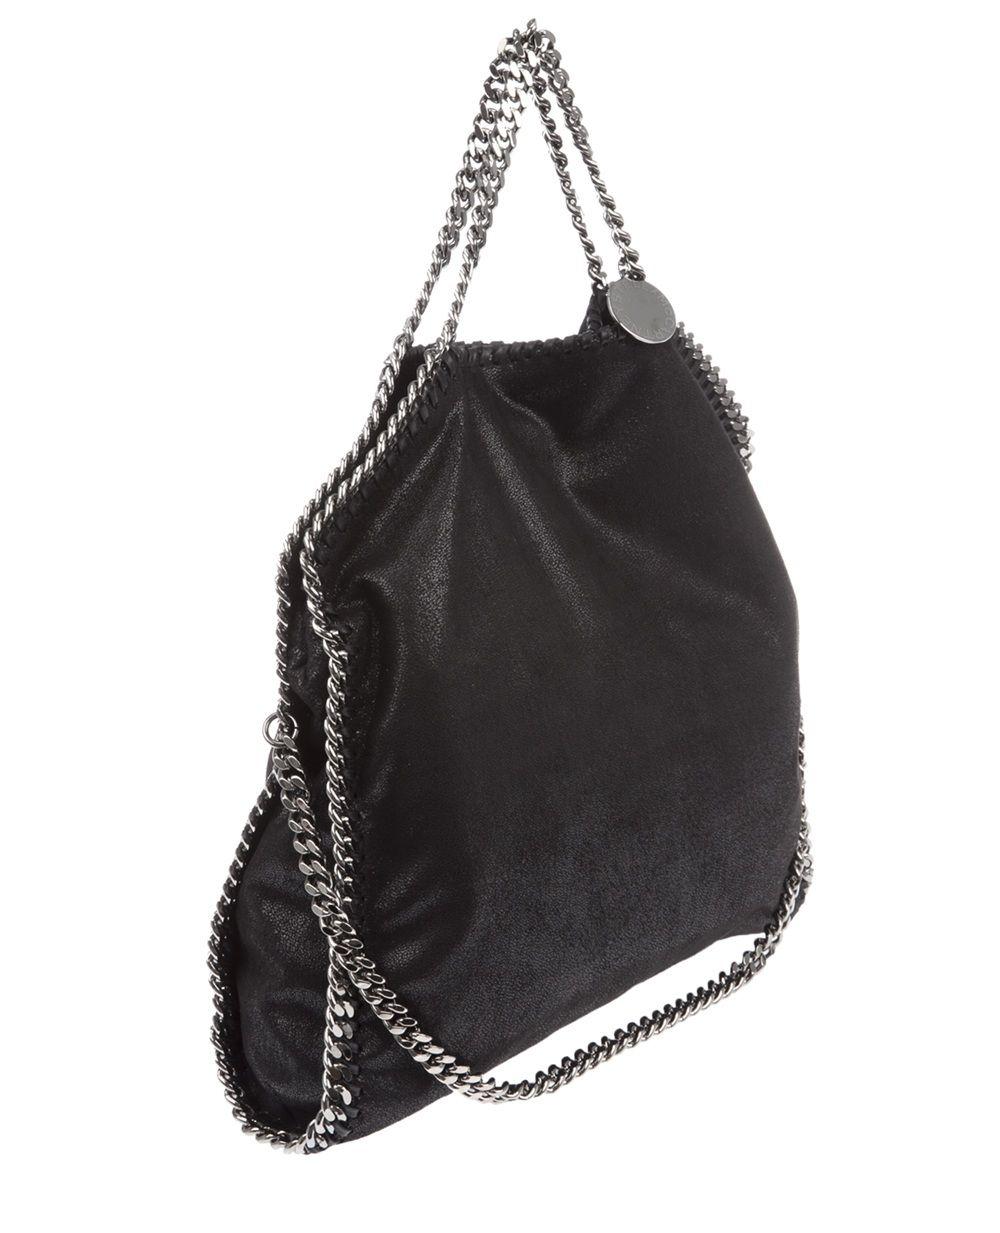 Connu Non-Leather Bags. | Stella McCartney, Stella mccartney falabella  AC13